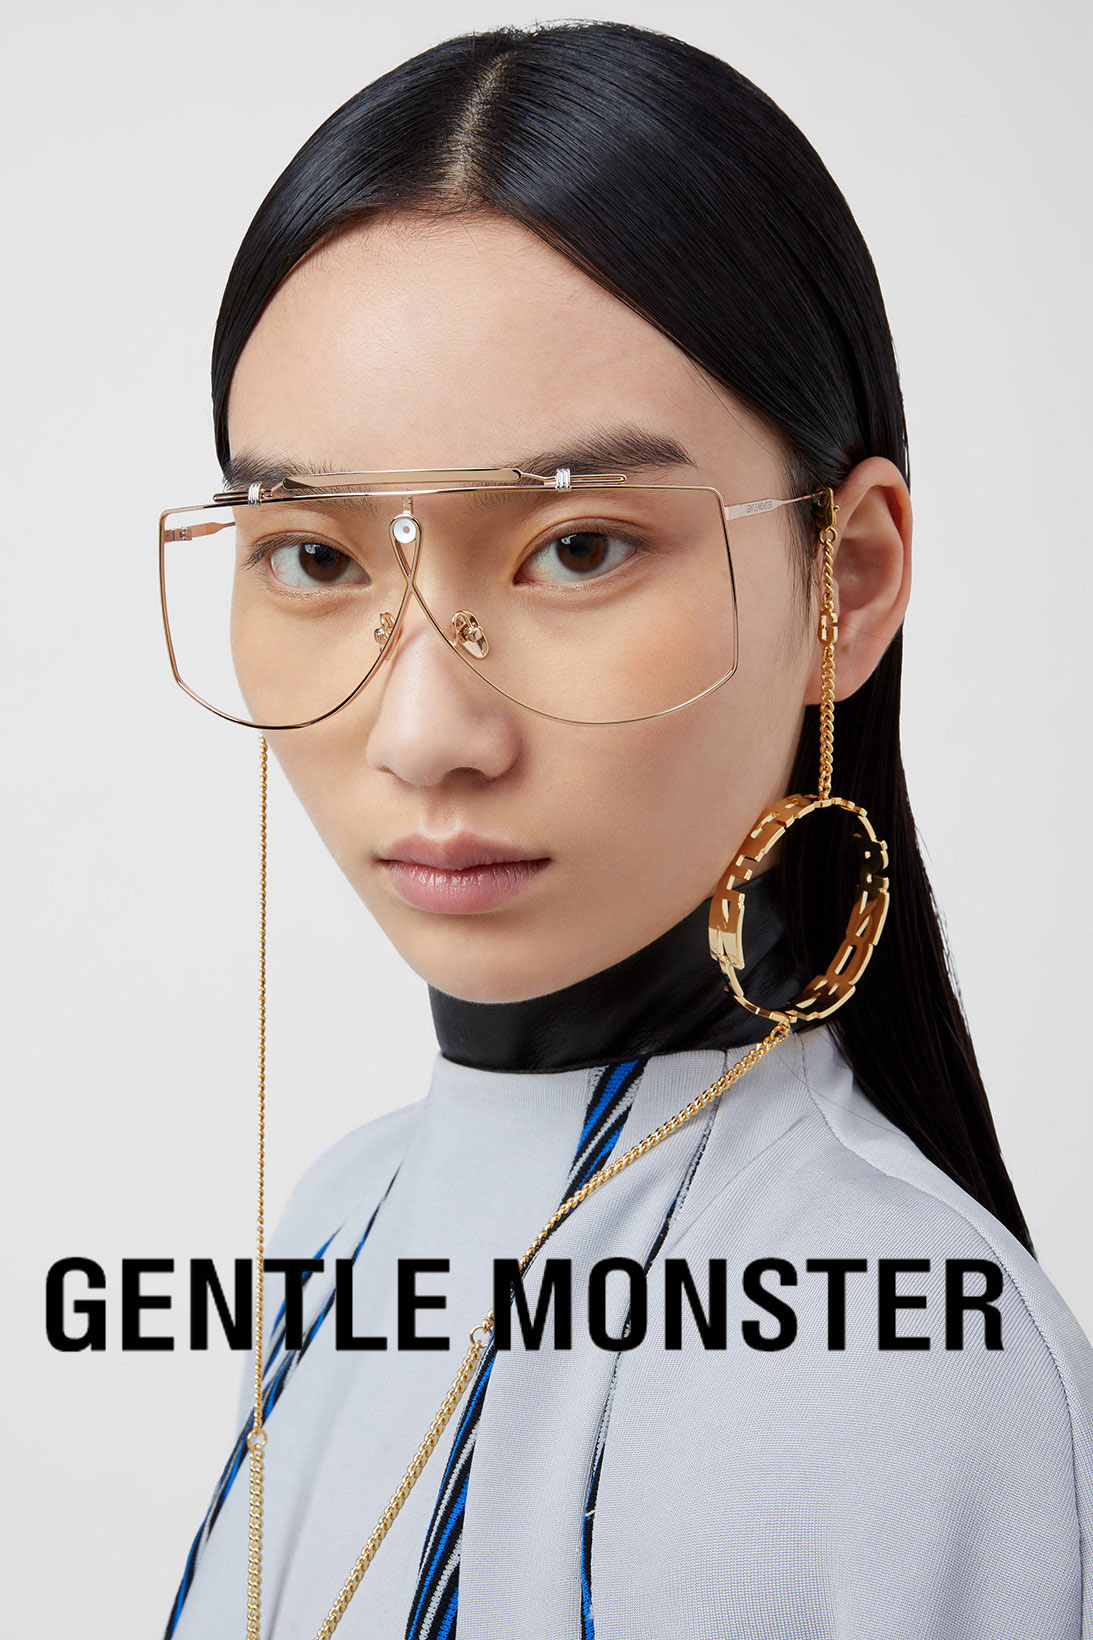 Roxane Dia Gentle Monster